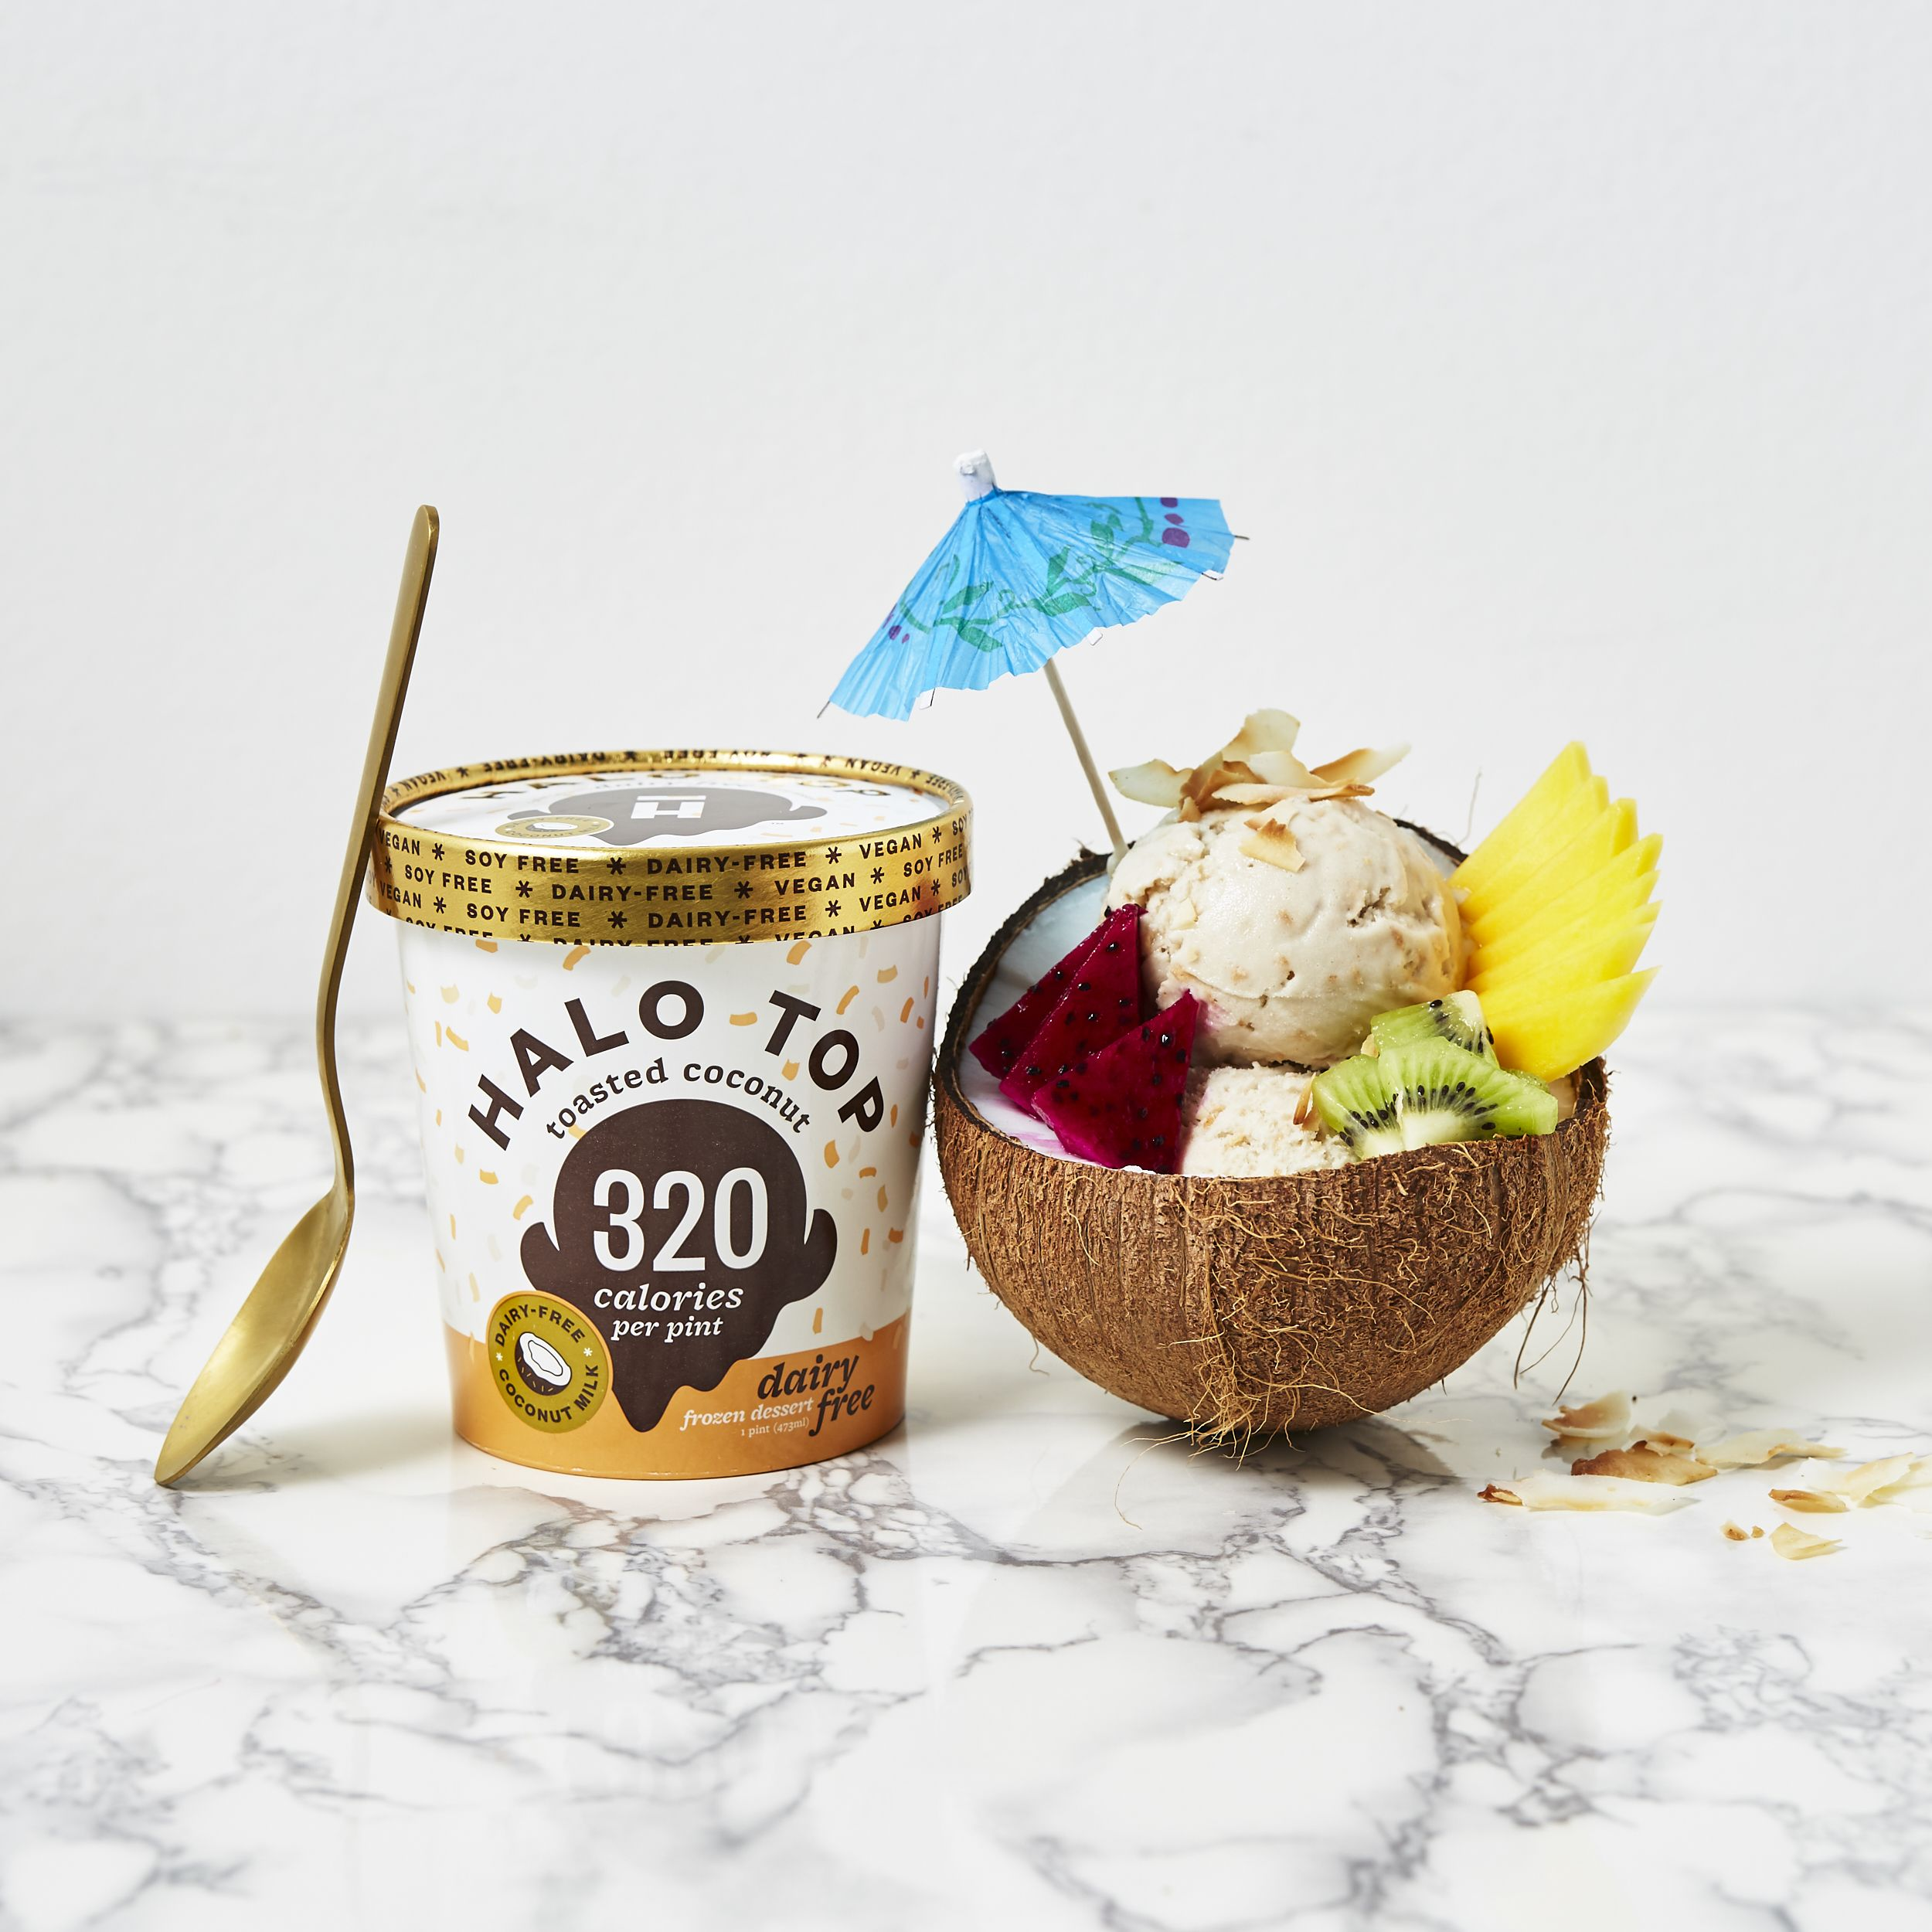 Halo Top Alicia Cho Photography Halo Top Ice Cream Tubs